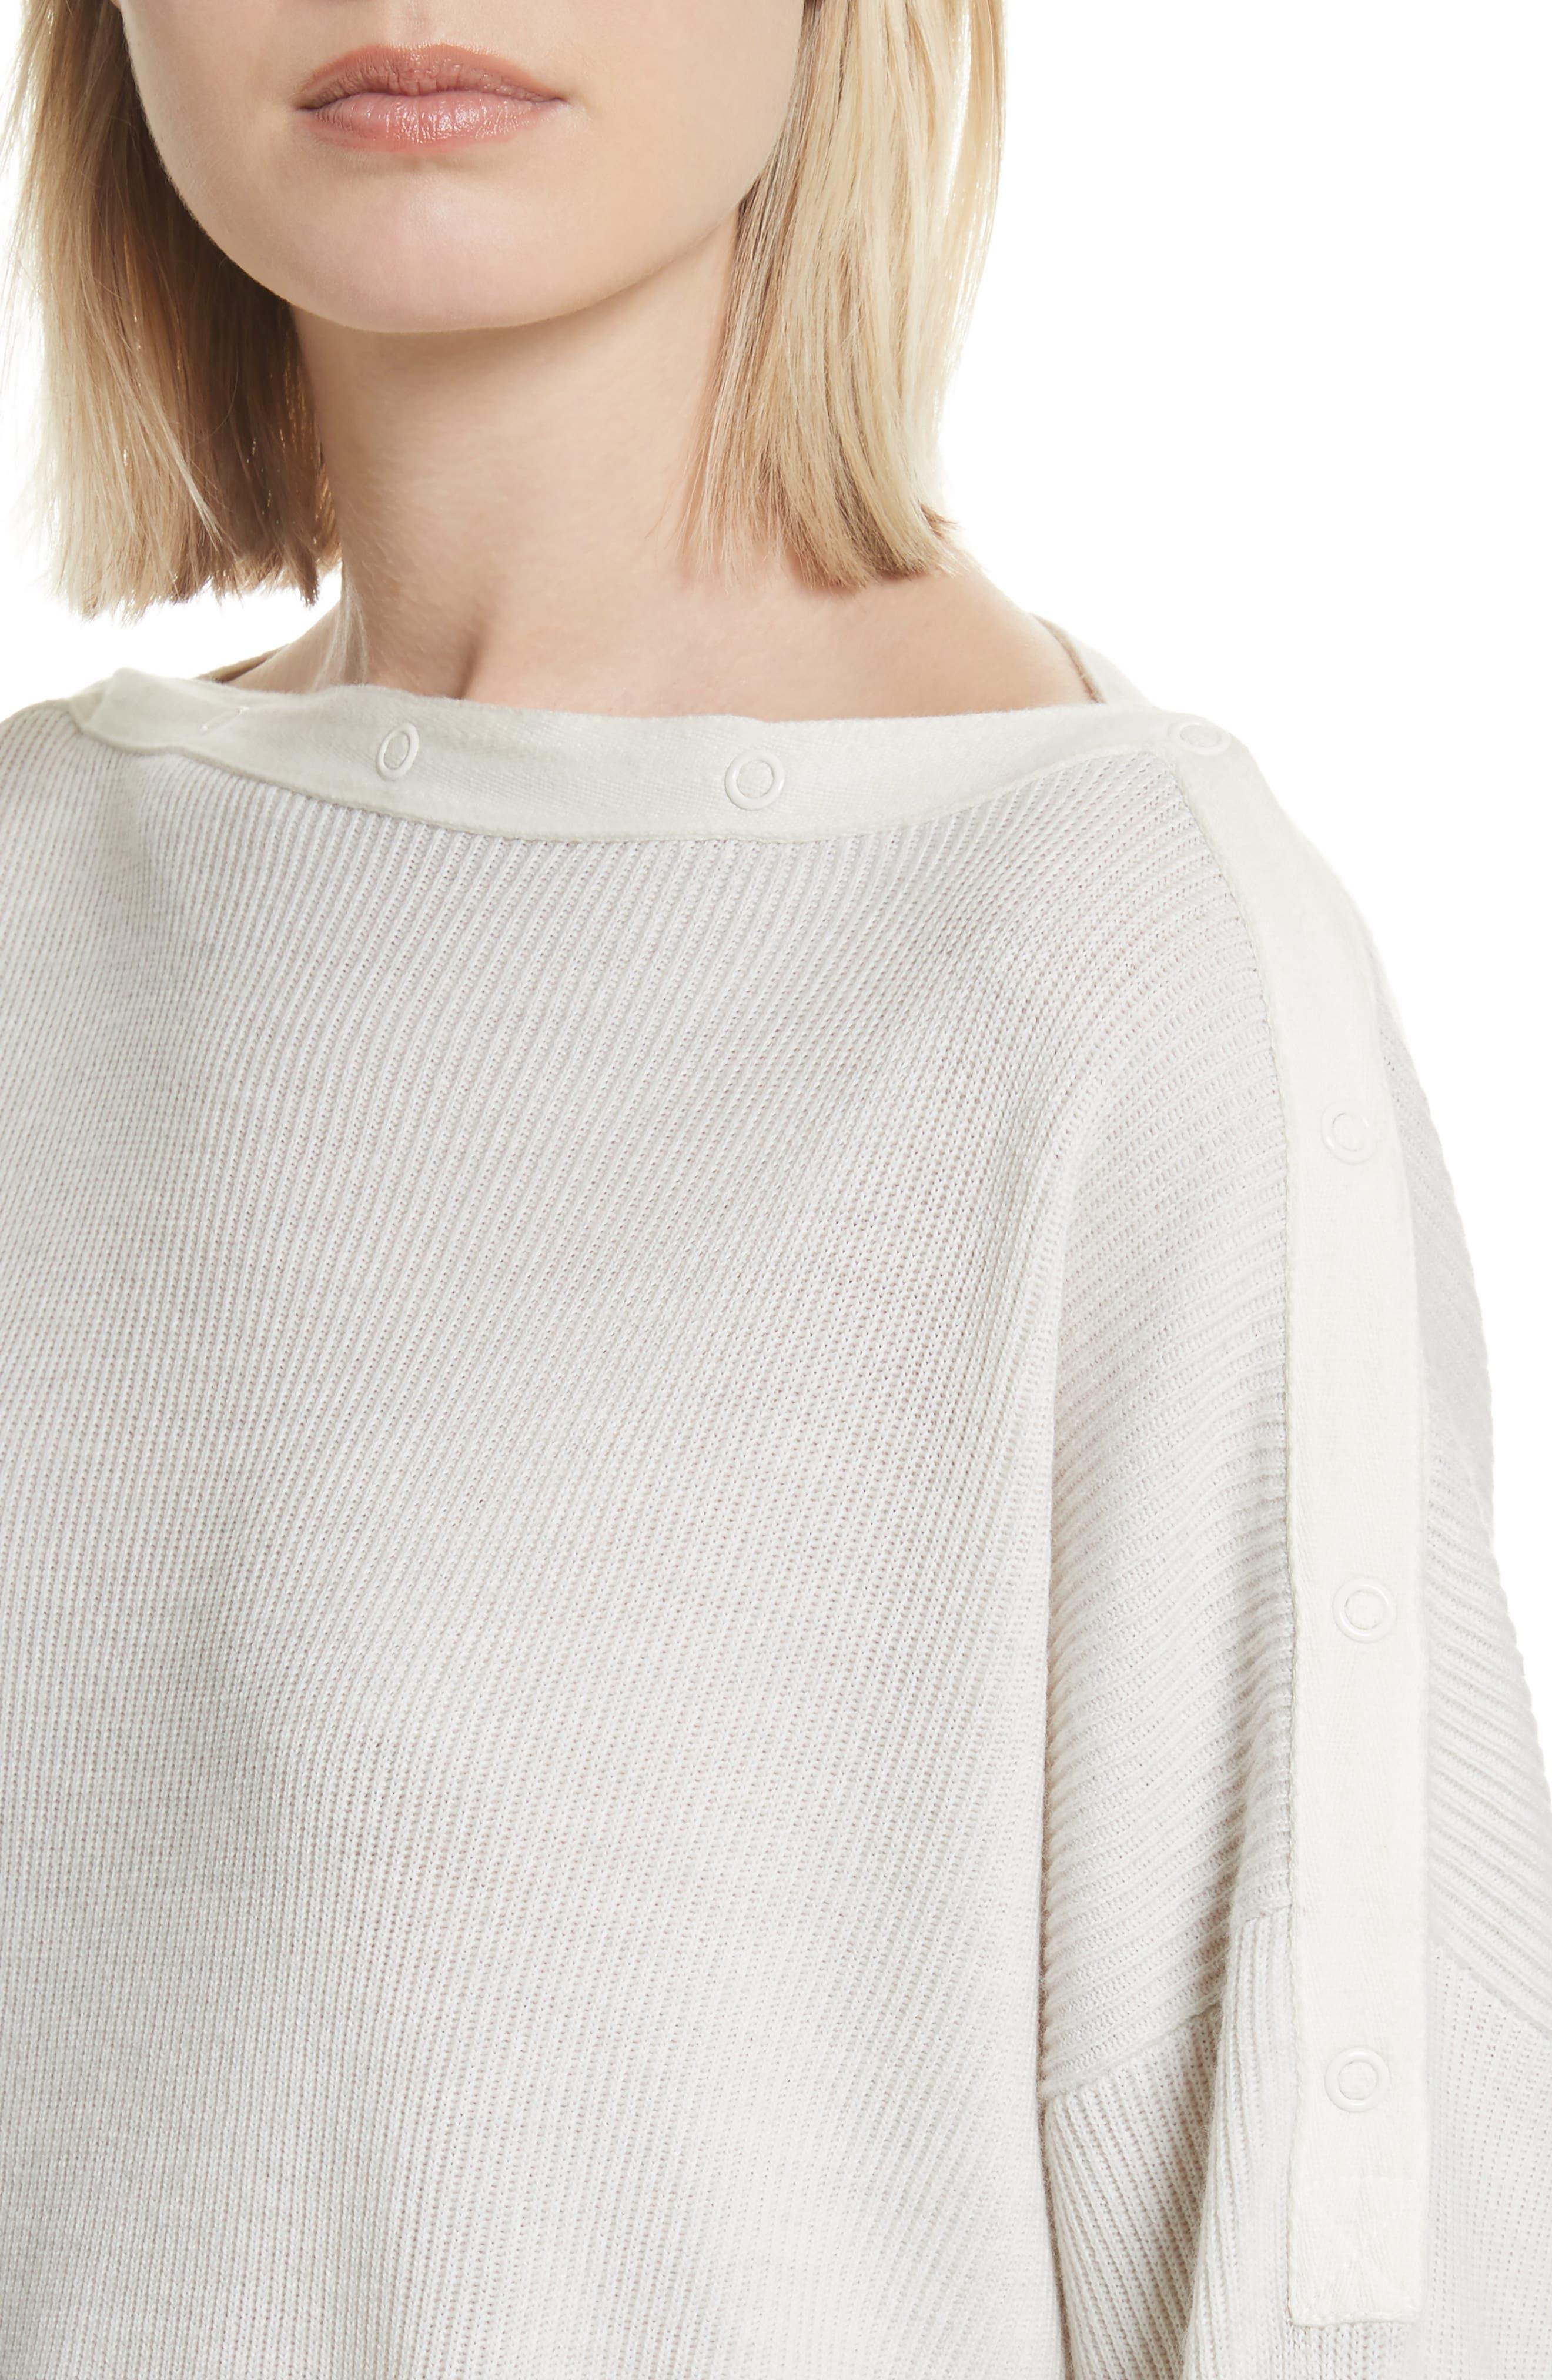 T by Alexander Wang Snap Detail Merino Wool Blend Sweater,                             Alternate thumbnail 4, color,                             906